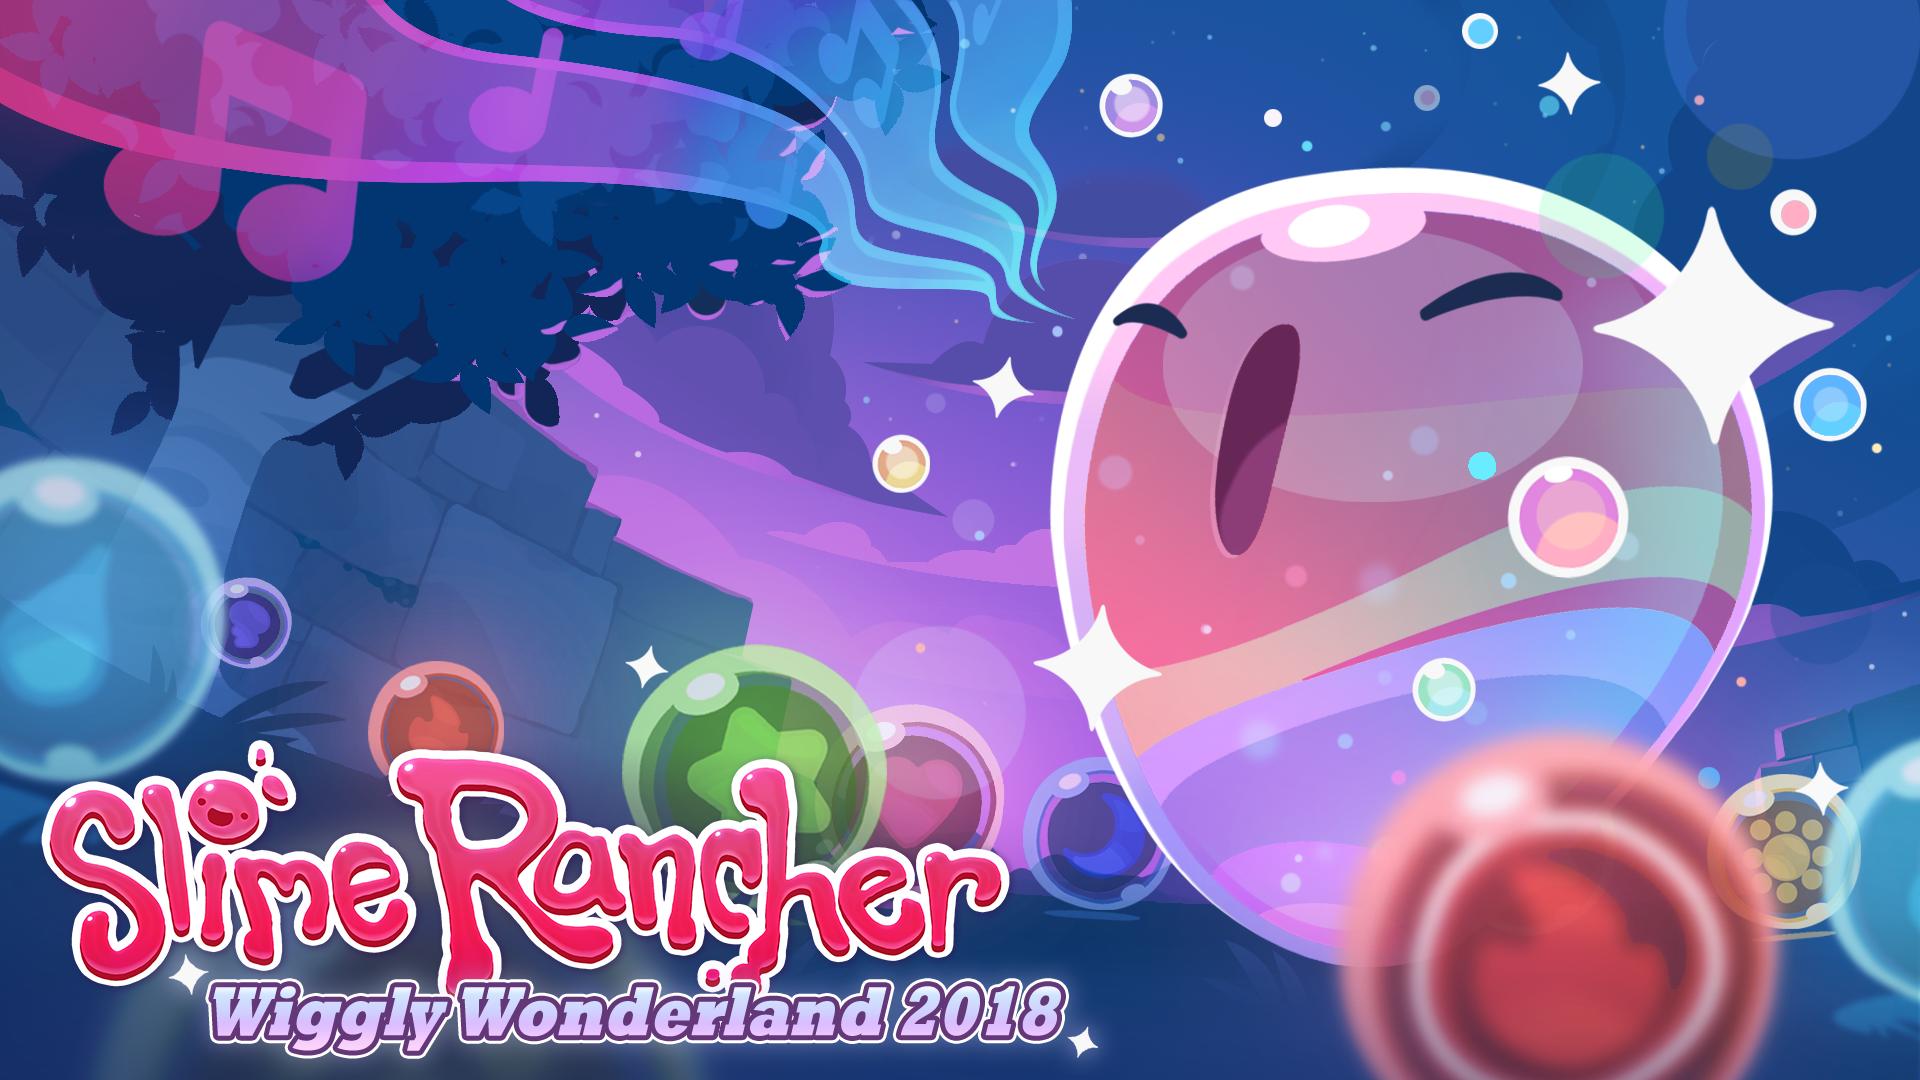 Wiggly Wonderland 2018 Slime Rancher Wikia